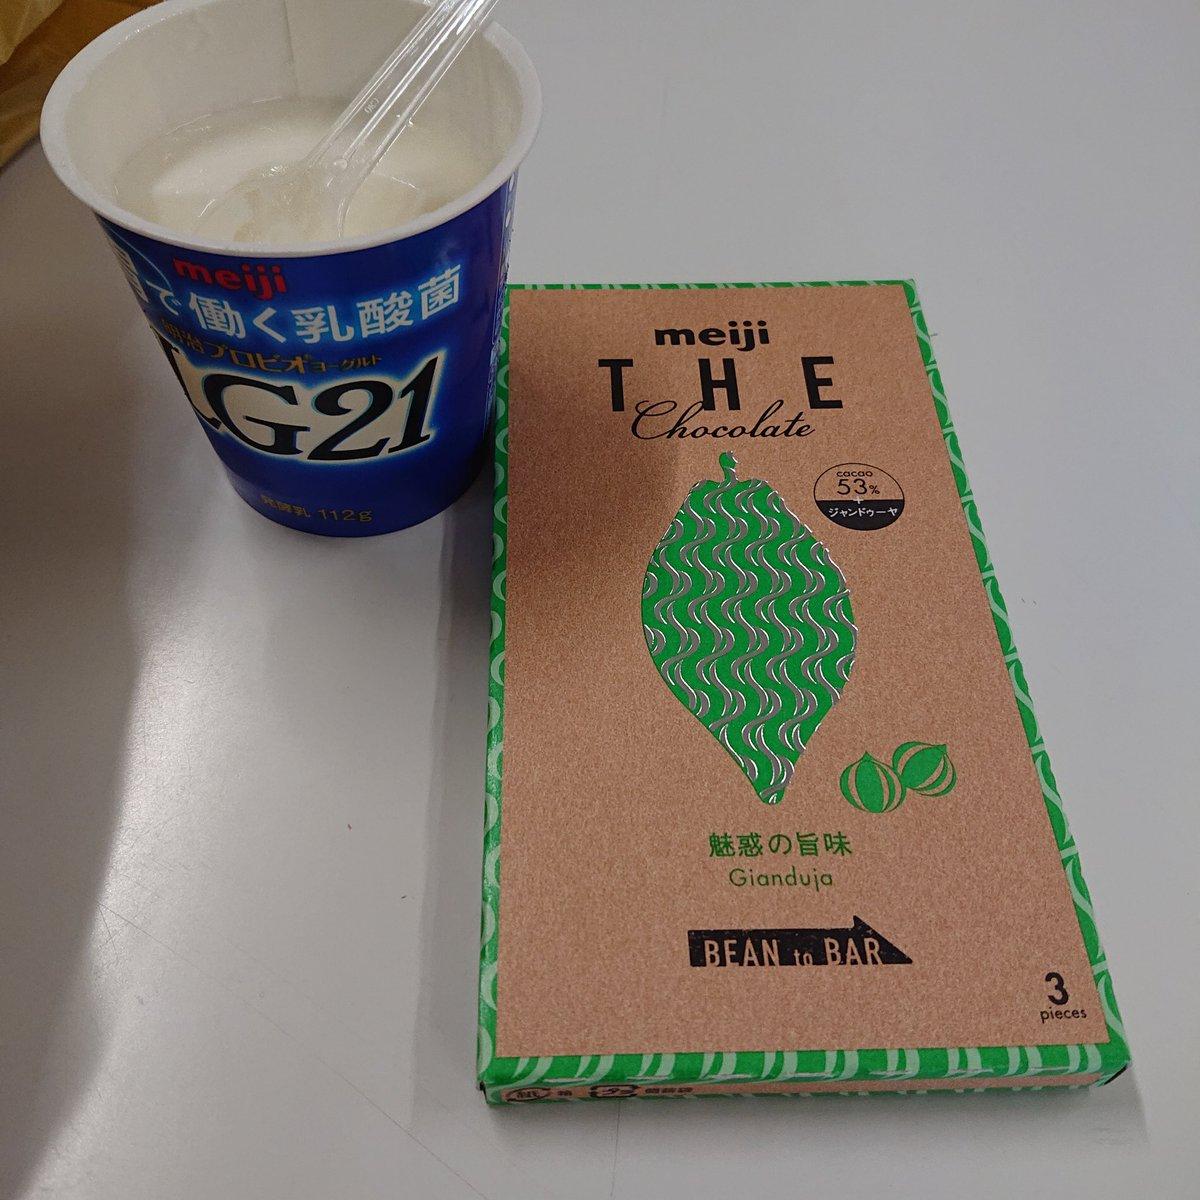 RT @JunJunJunJun15: イラッとしたら深呼吸👄 たまには贅沢🍫🆗✌️  #meiji THE Chocolate #LG21 https://t.co/V7q7Ndsixb